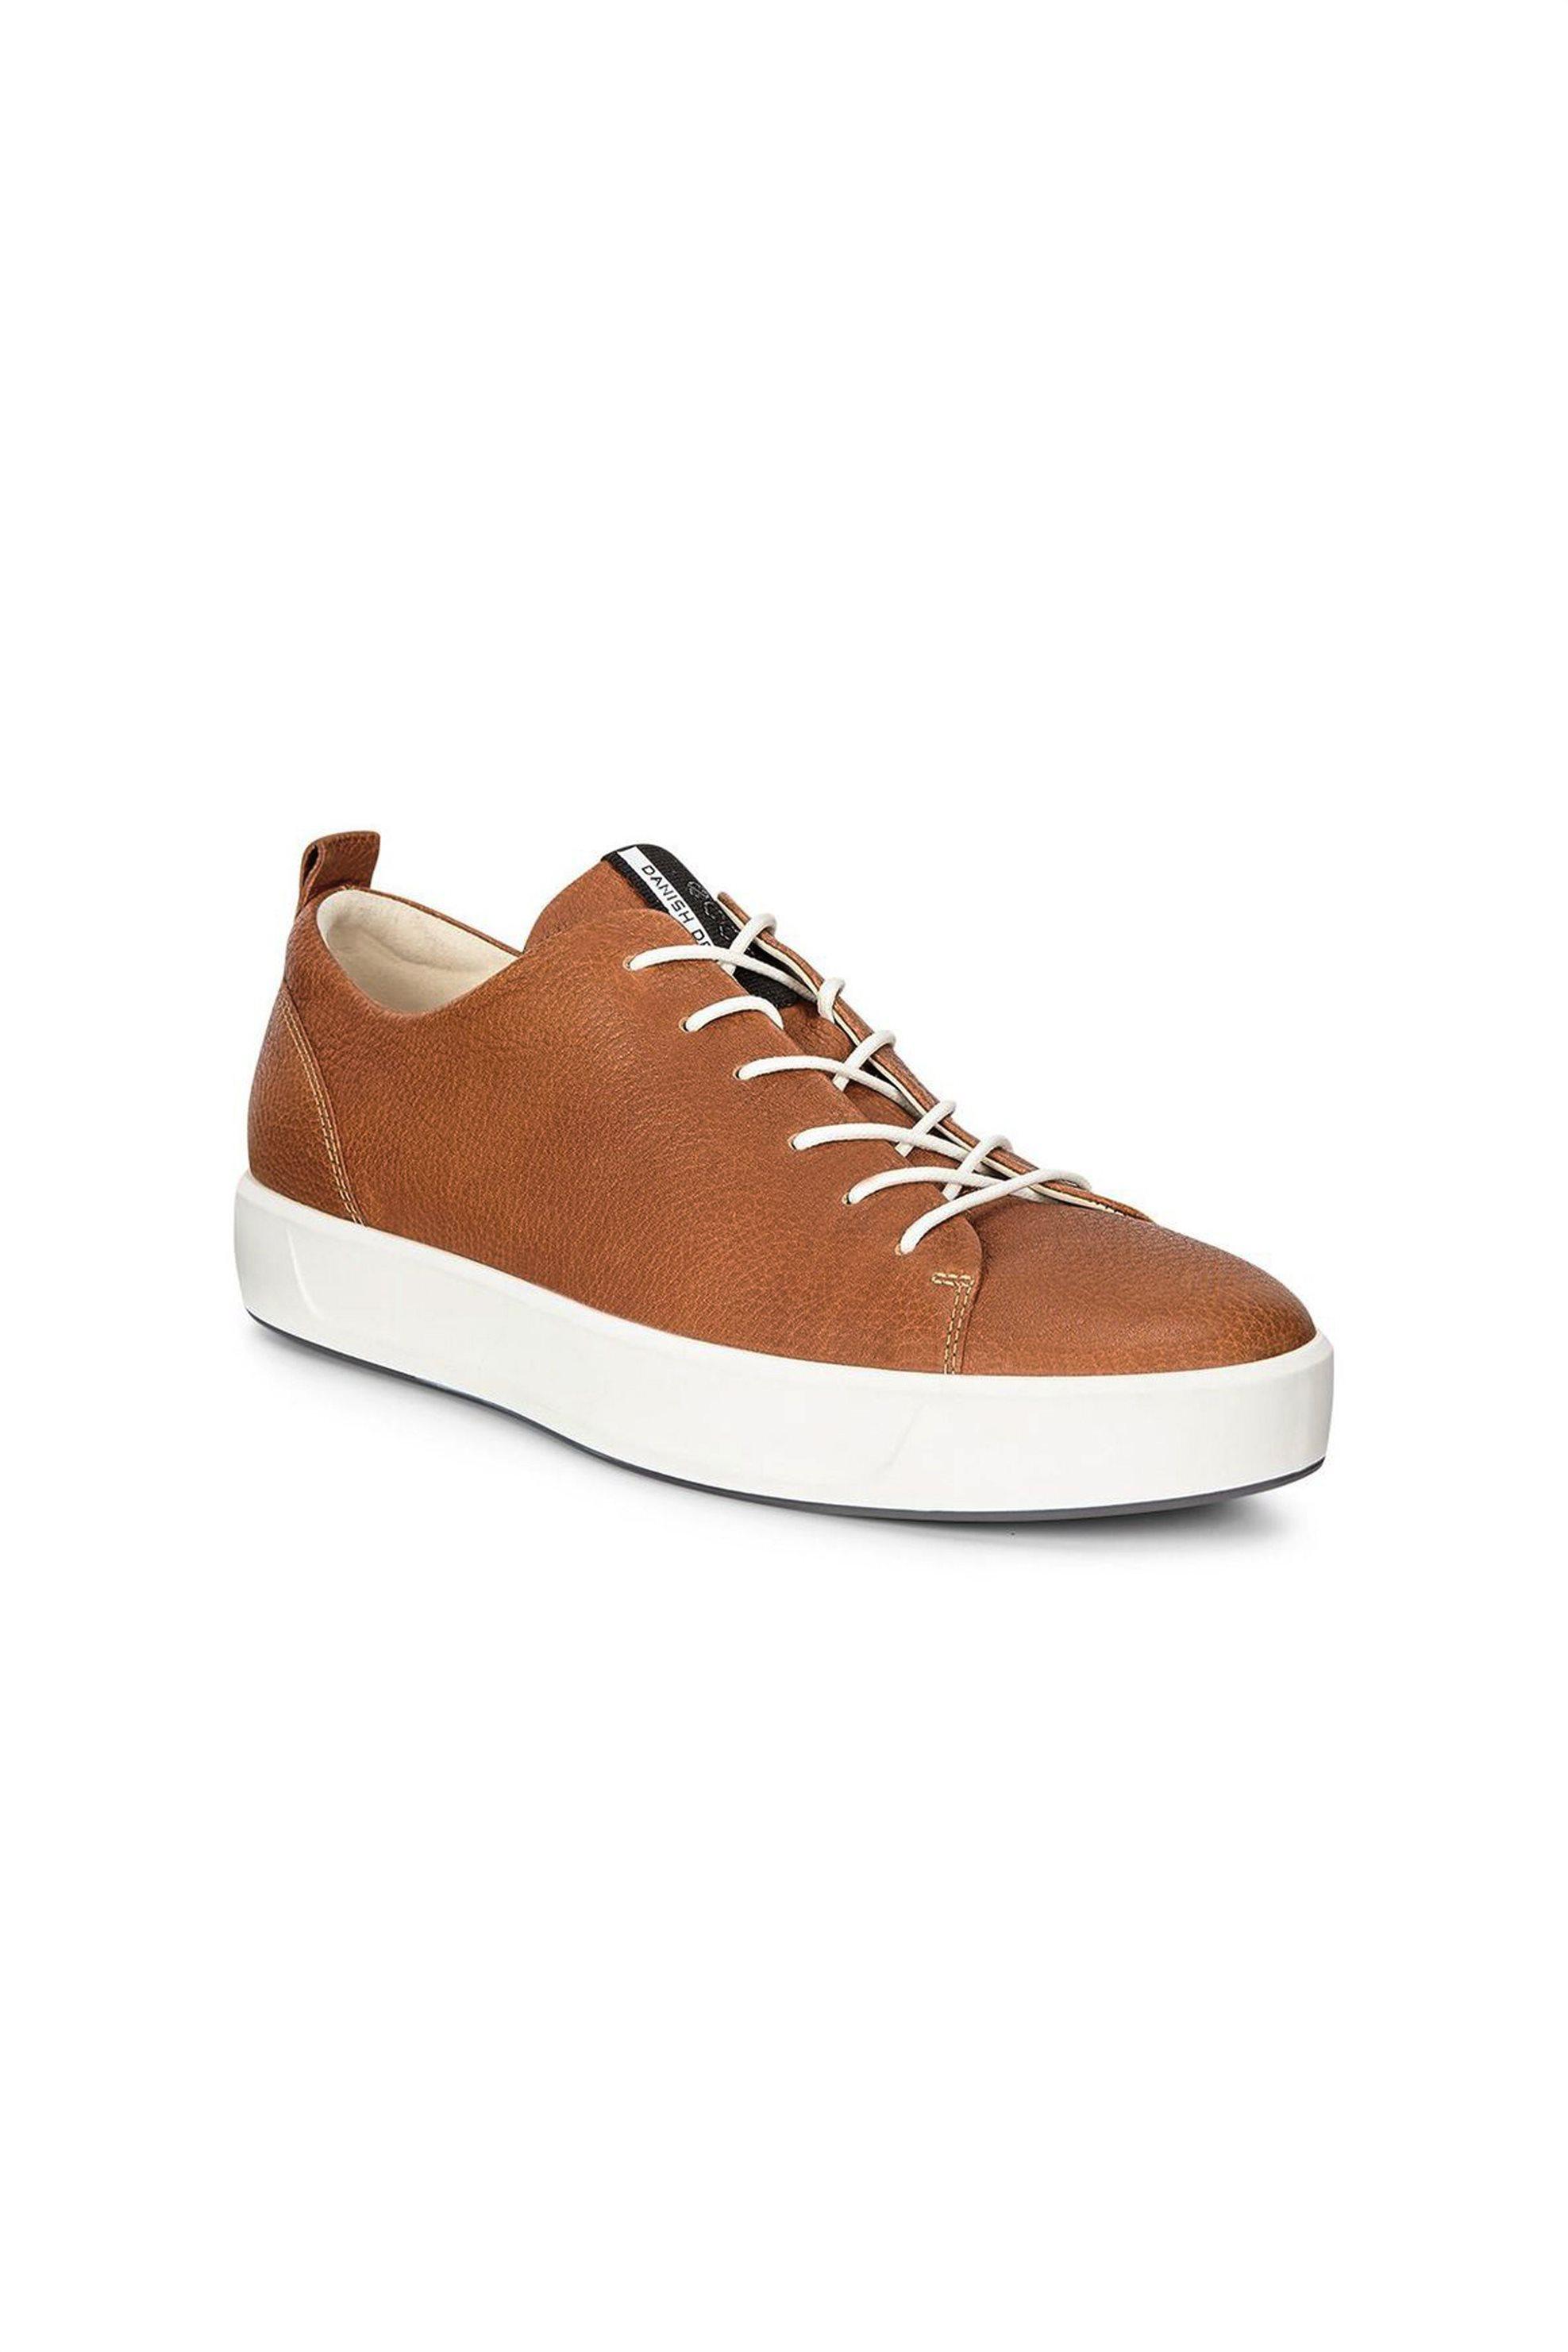 ECCO ανδρικά sneakers με κορδόνια Soft 8 – 440504 – Ταμπά